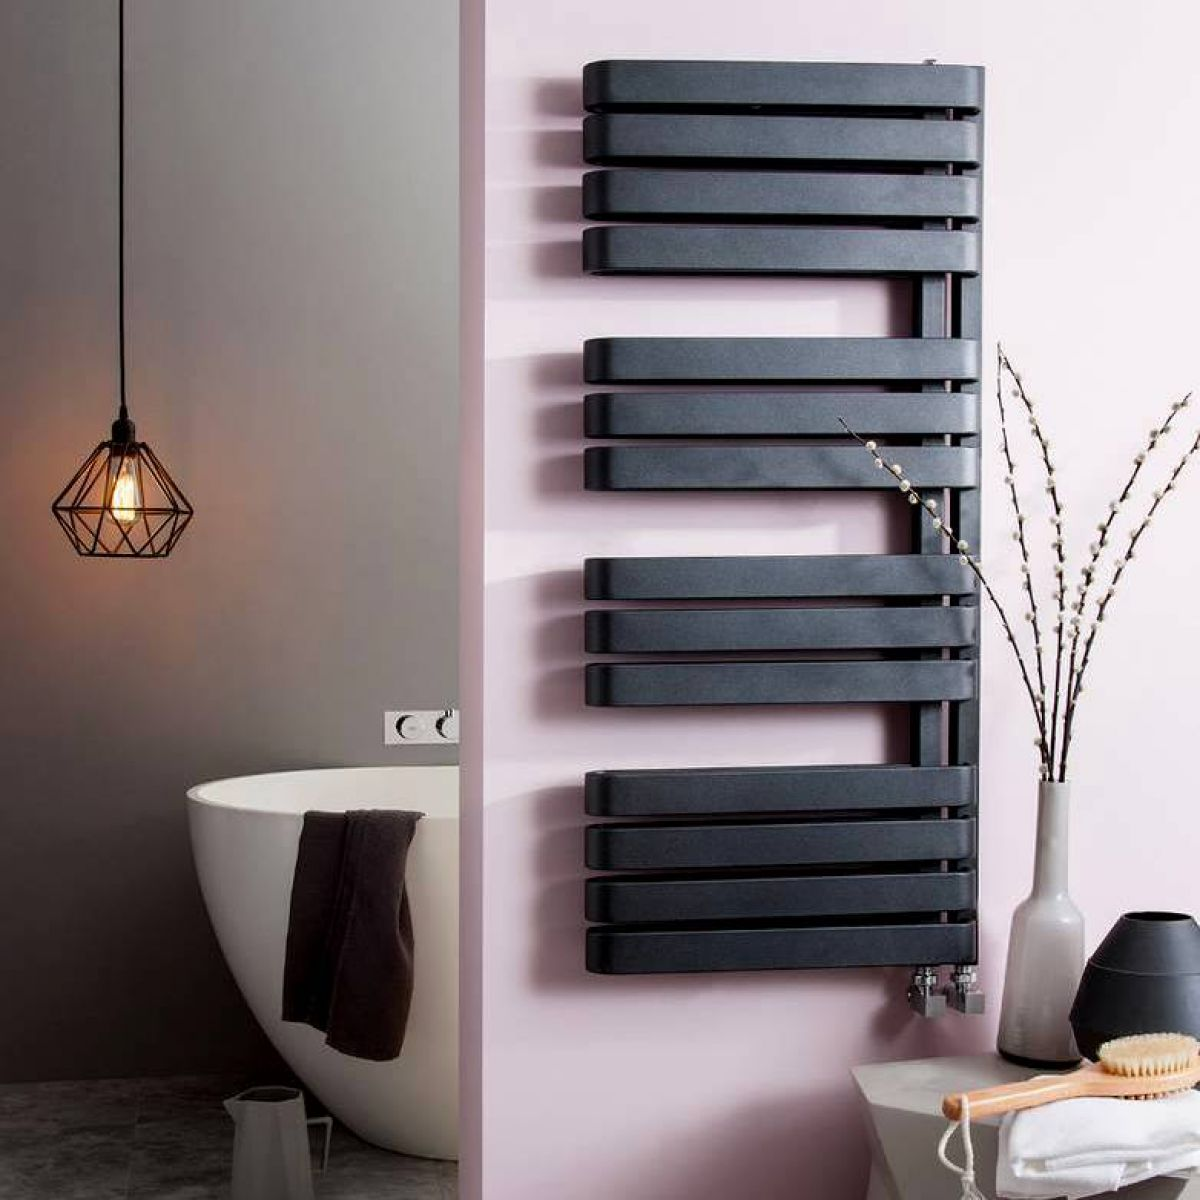 Bauhaus Svelte Towel Warmer